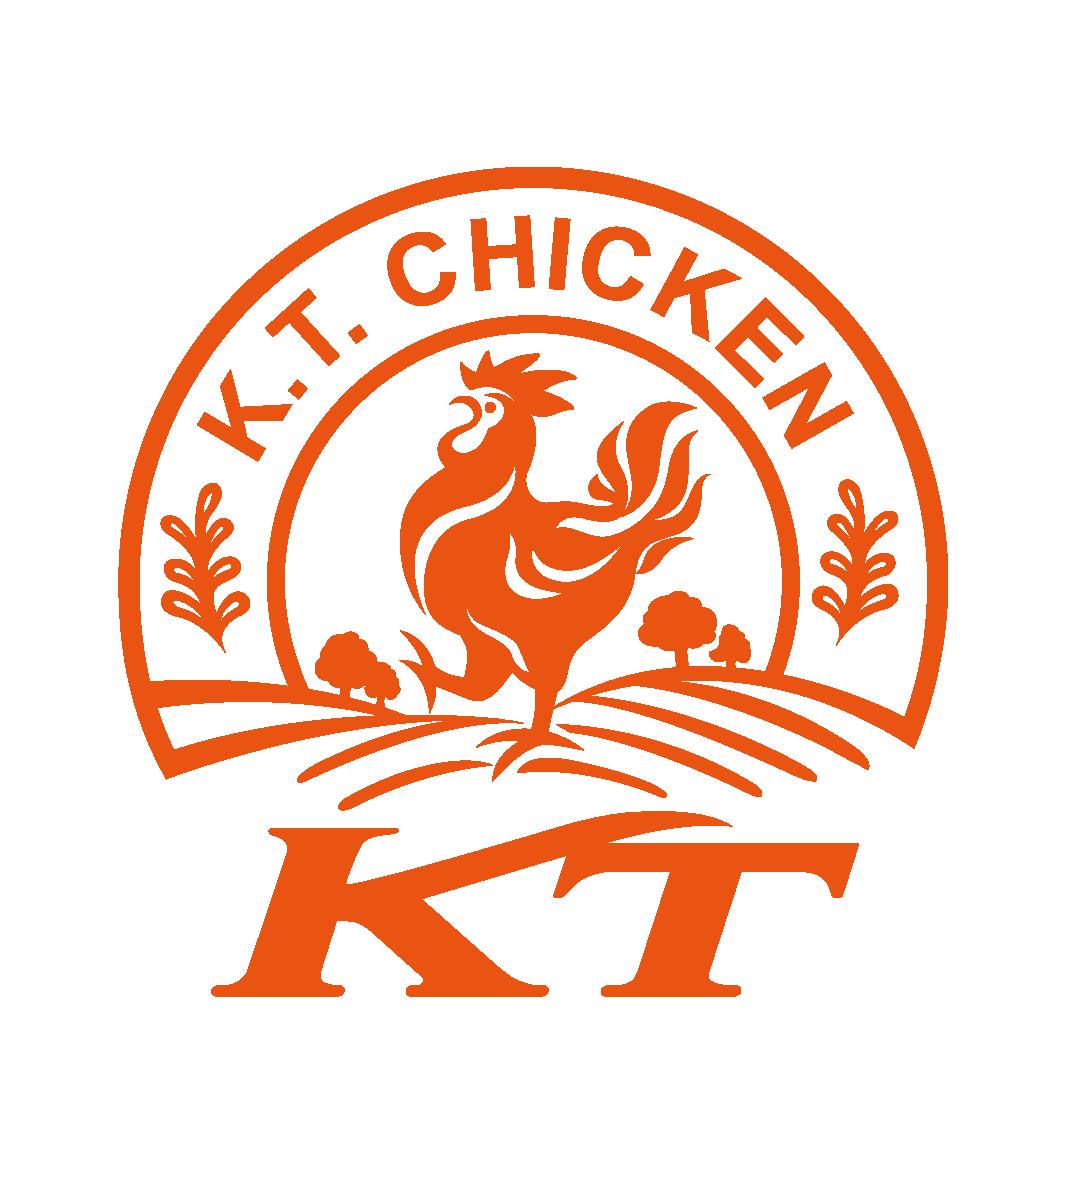 桂丁雞logo